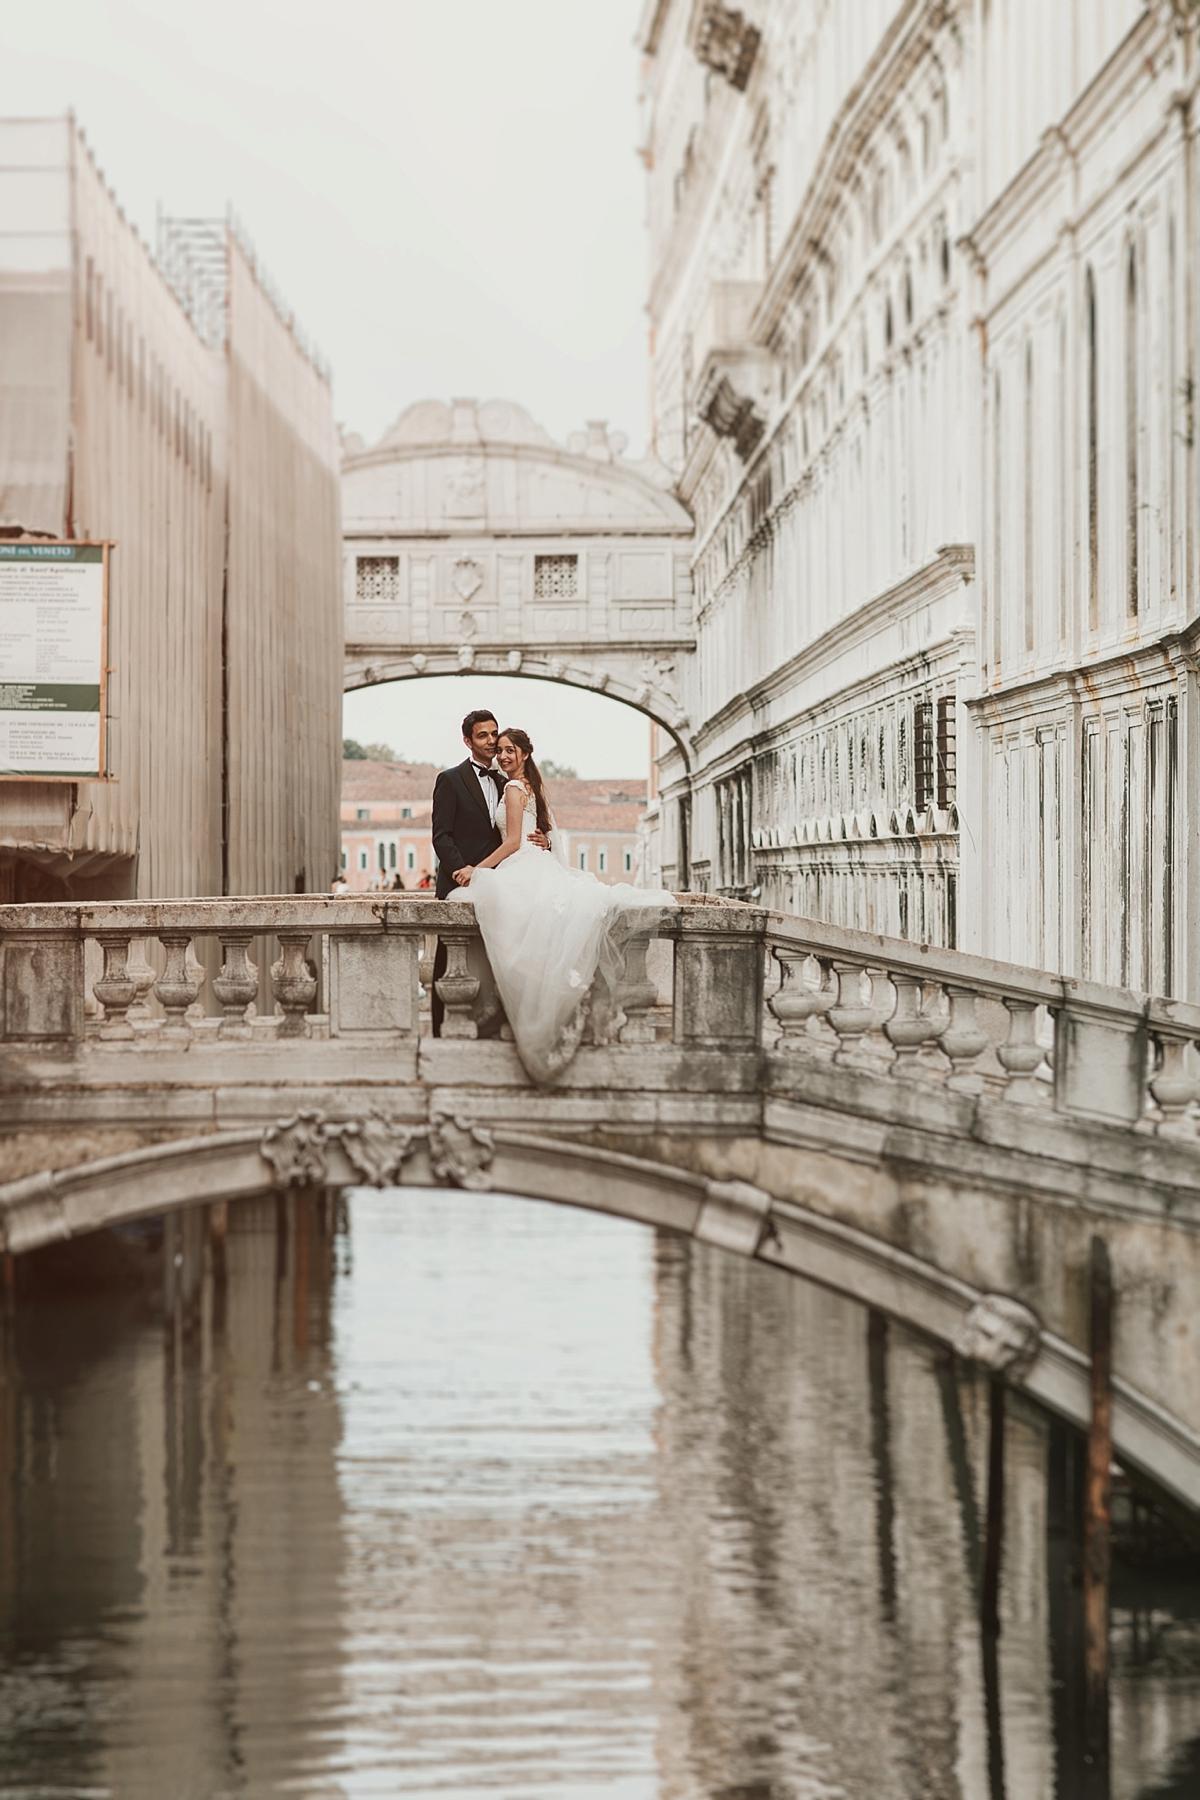 romantica-luna-di-miele-a-venezia_0034